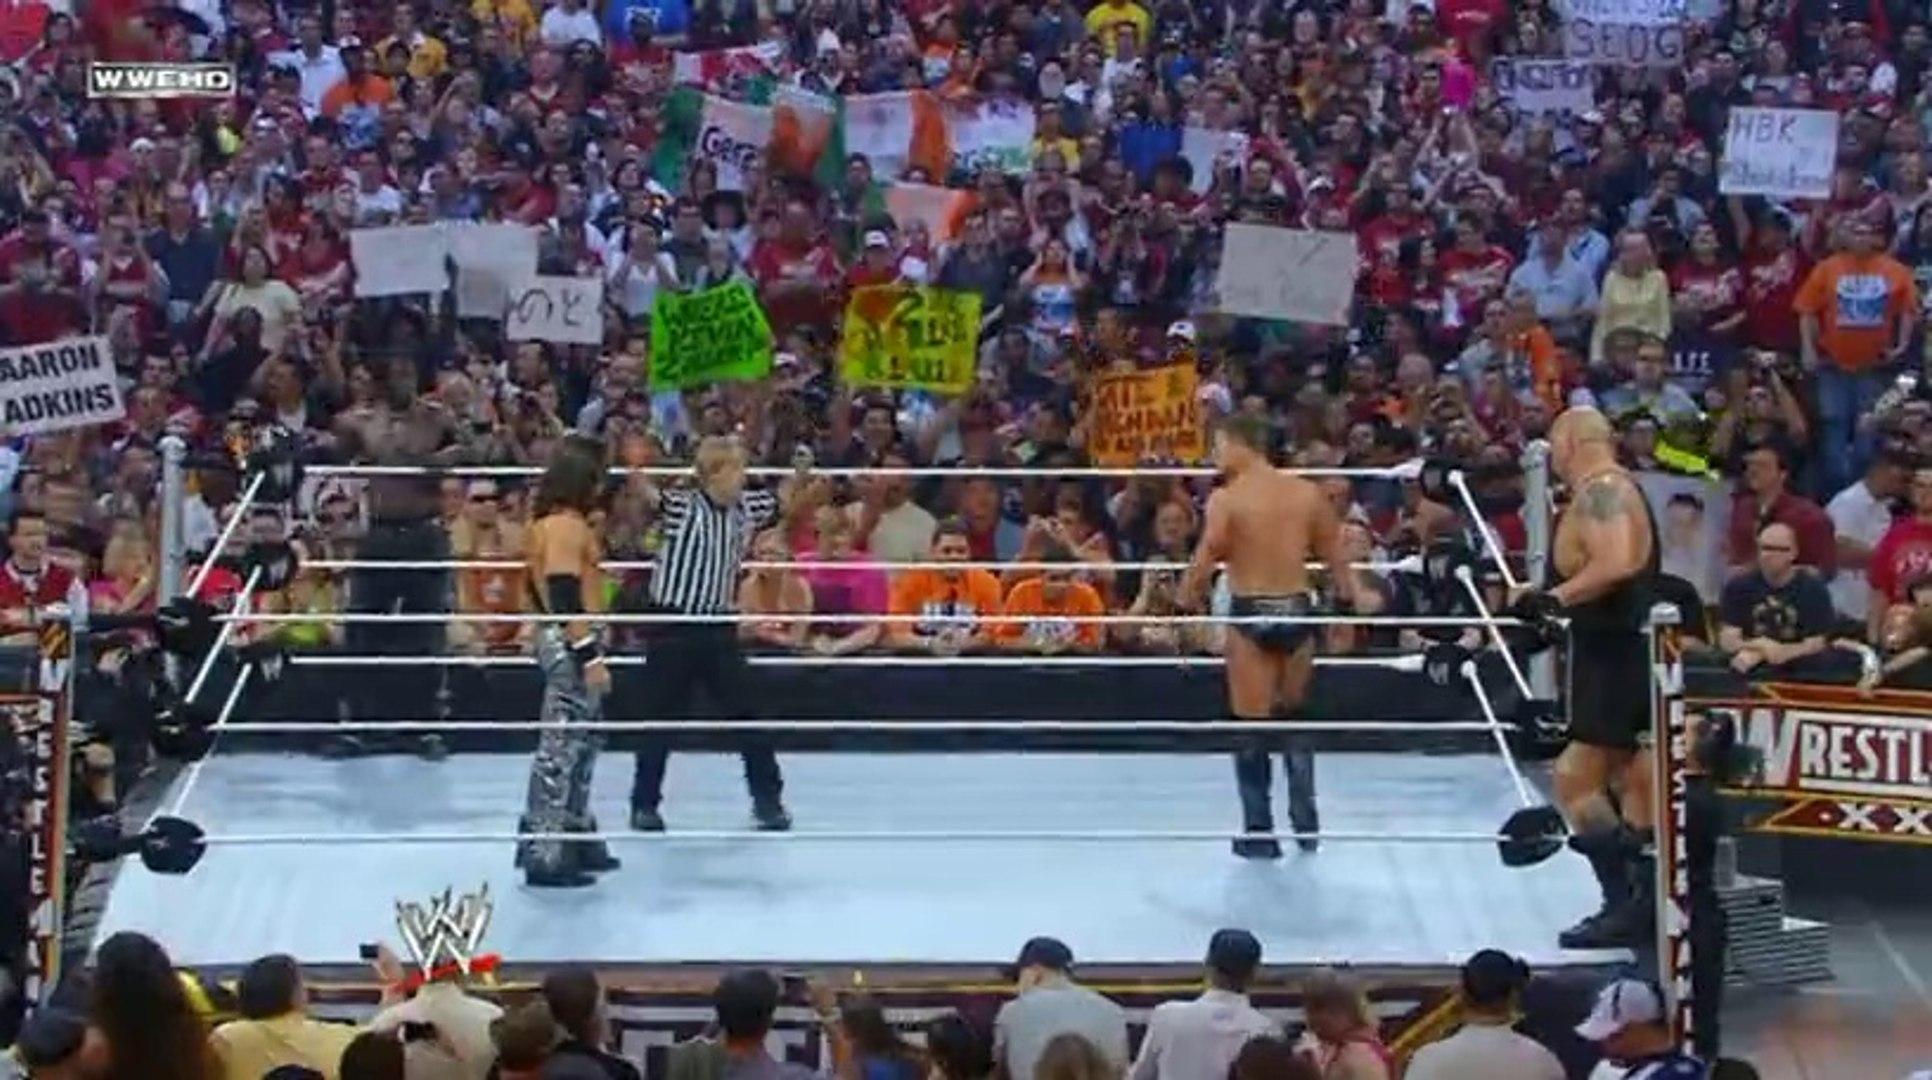 Resultado de imagem para John Morrison & R-Truth vs. ShowMiz - Wrestlemania 26